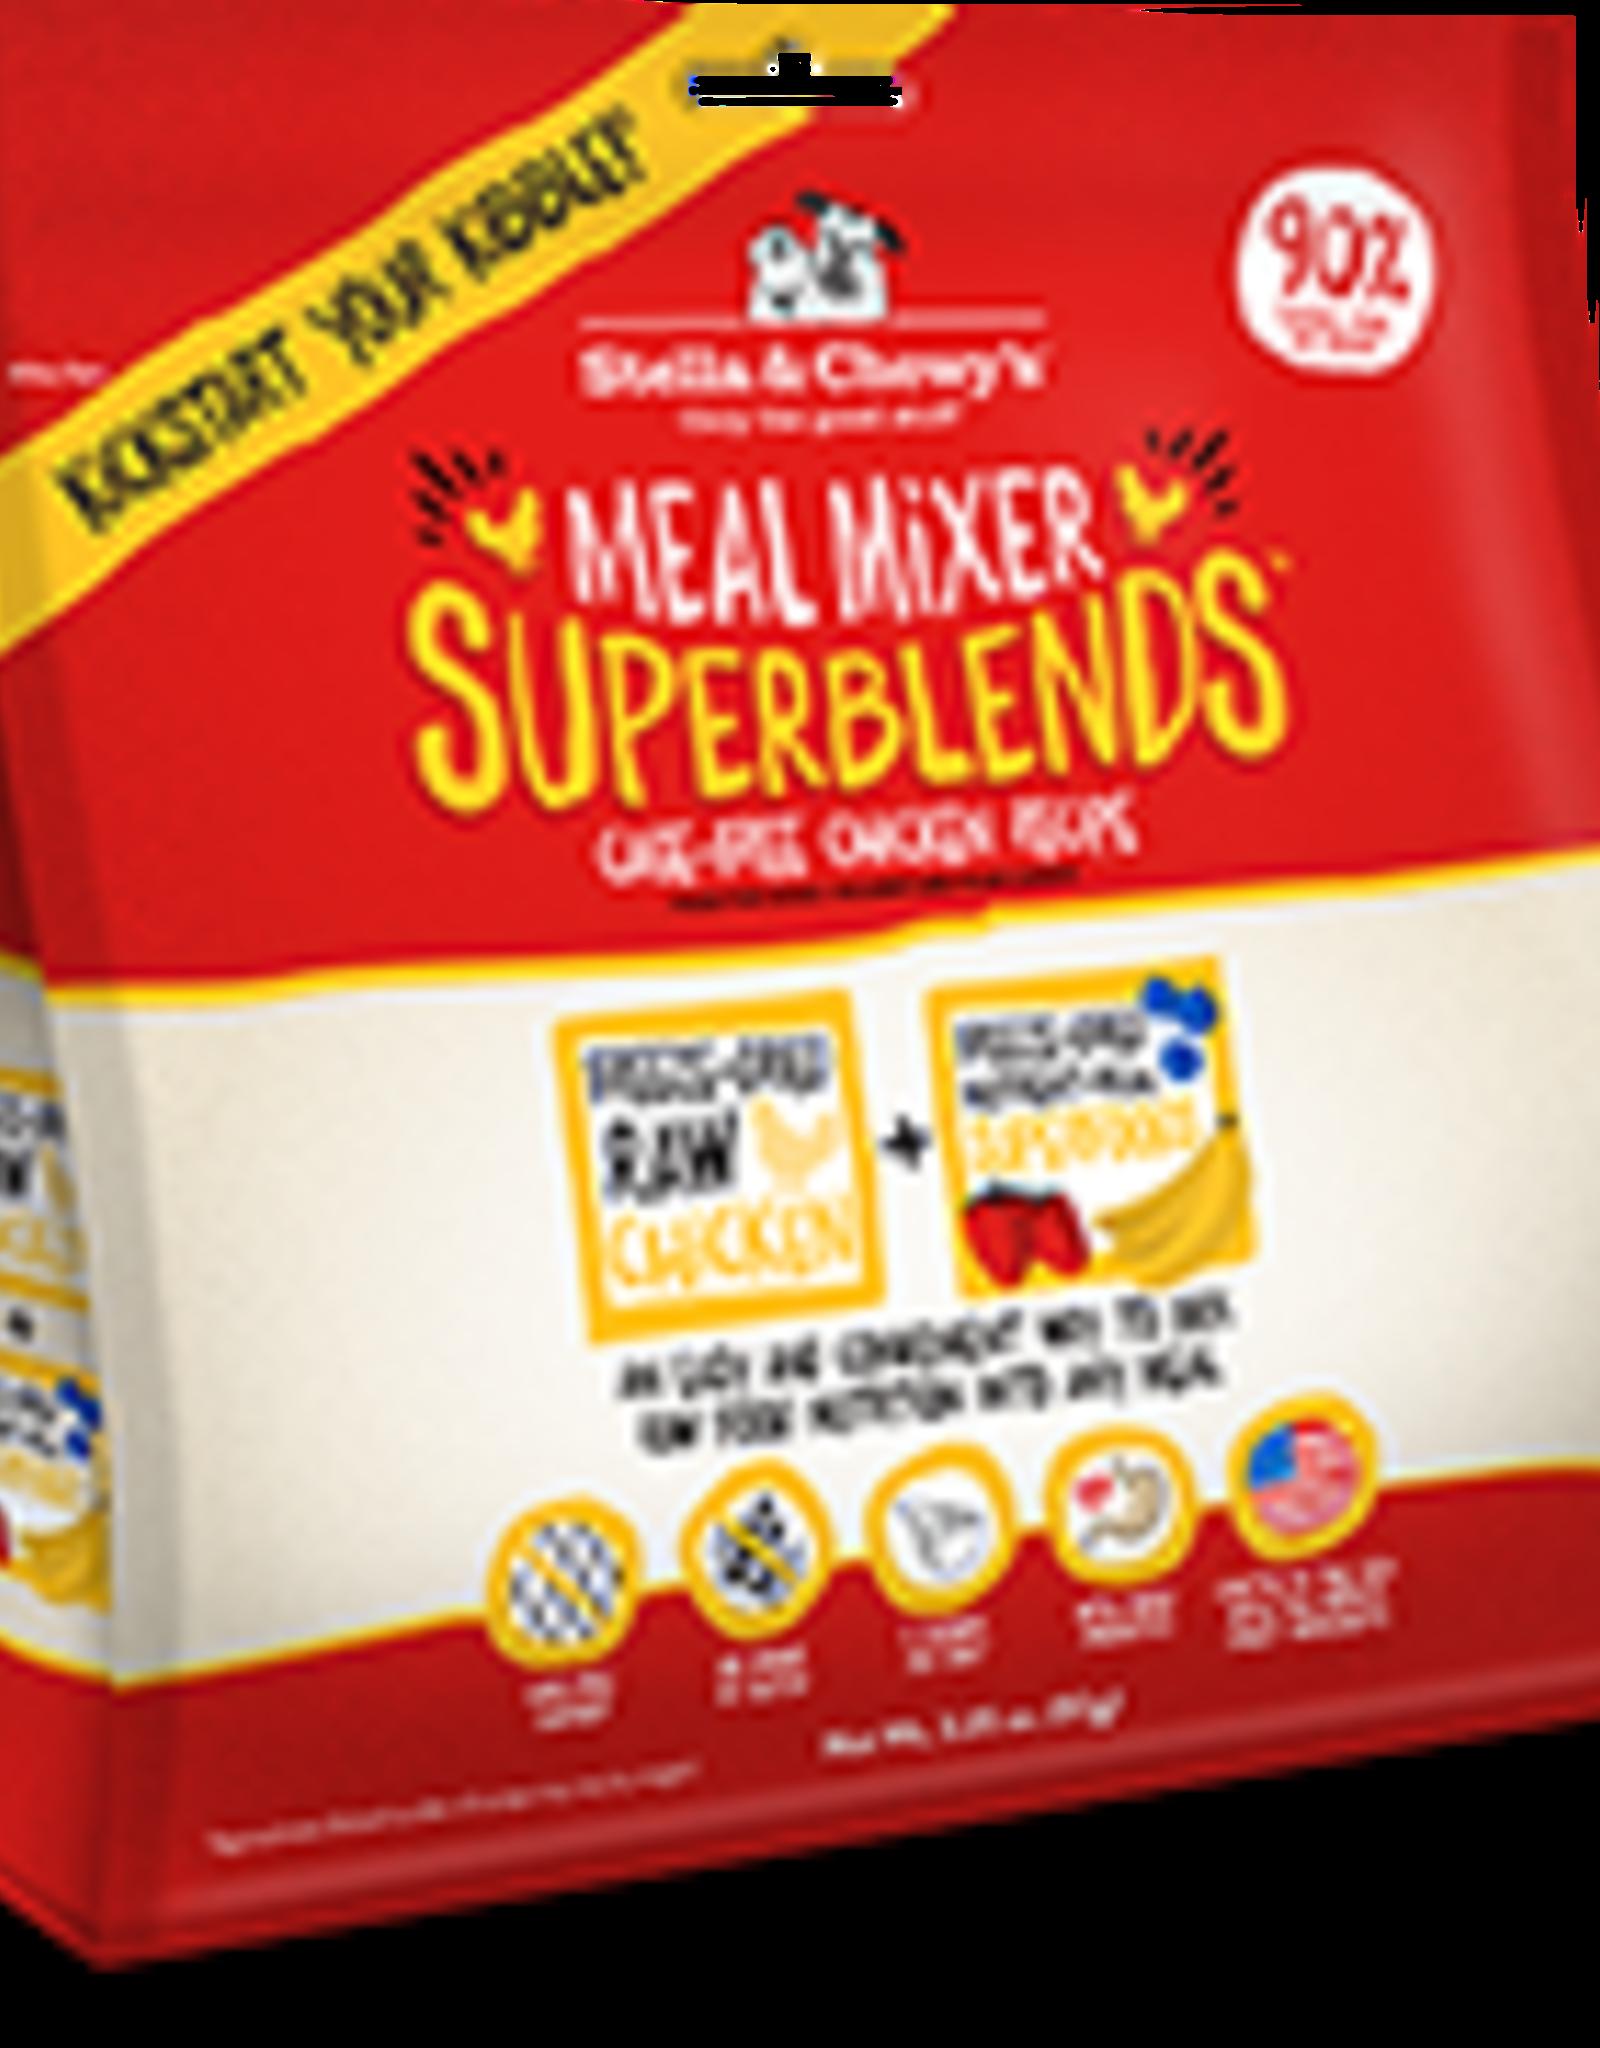 Stella & Chewys Meal Mixers: Superblends Chicken 8oz